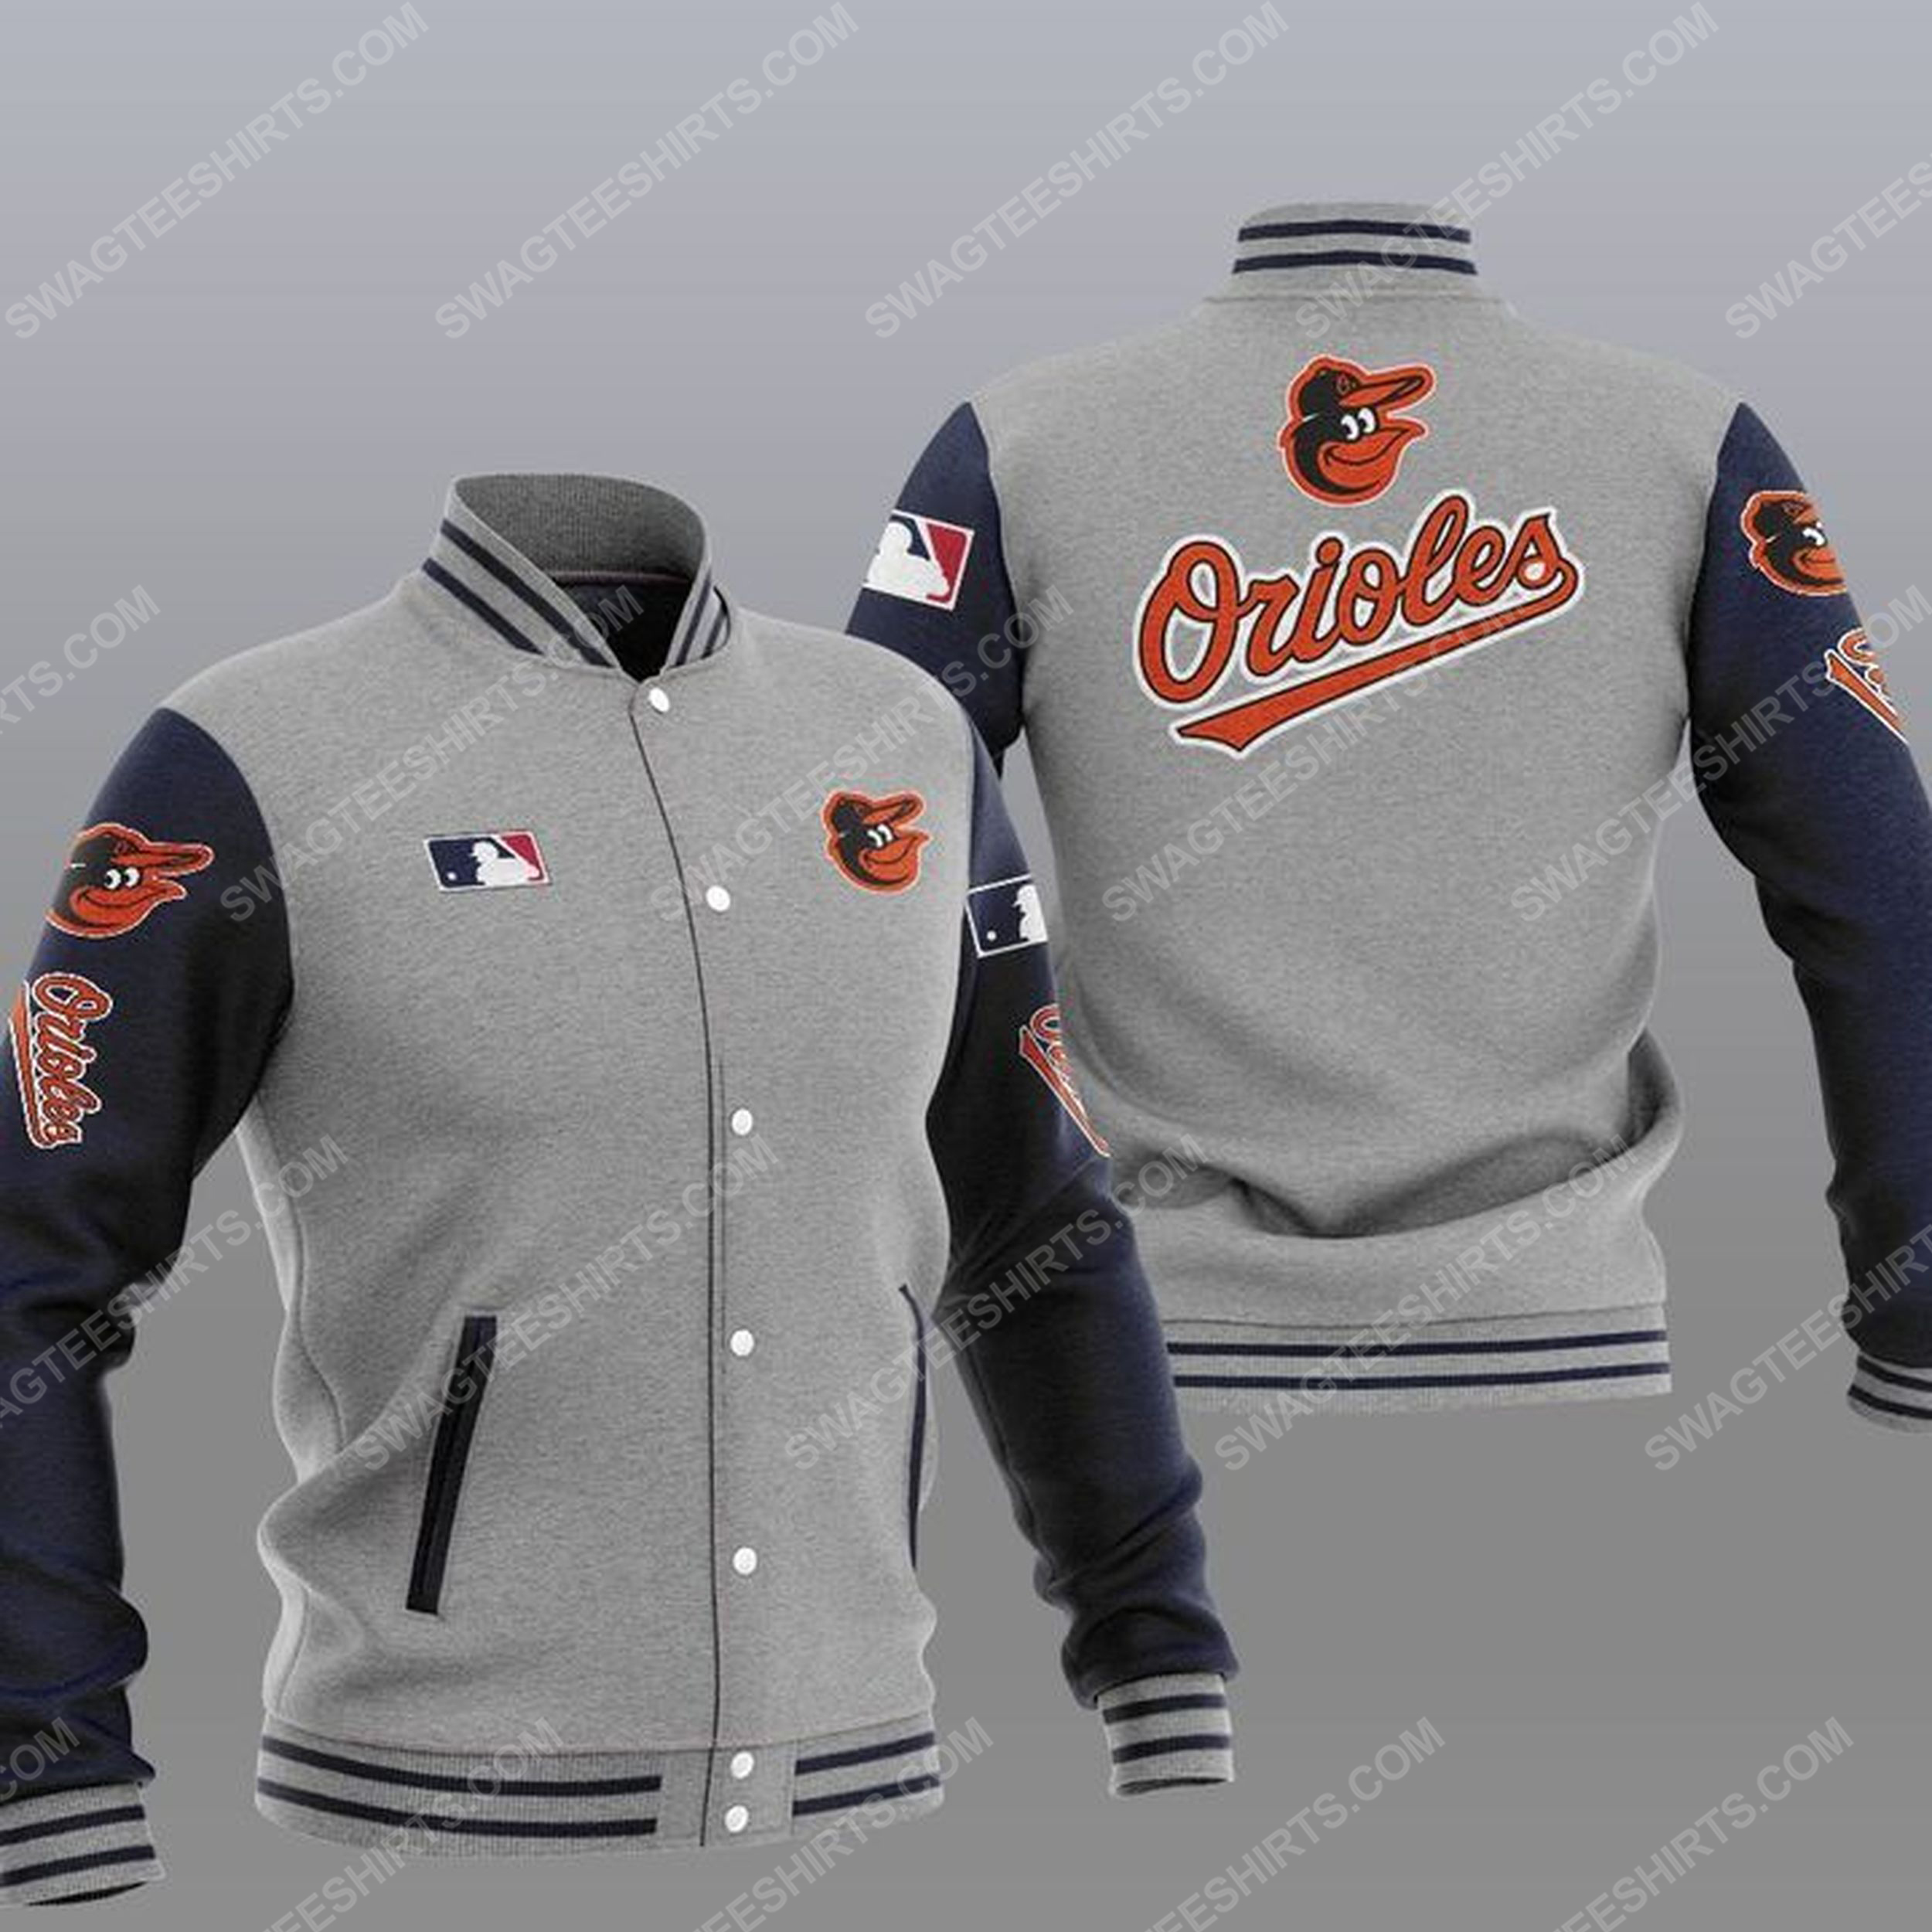 The baltimore orioles mlb all over print baseball jacket - gray 1